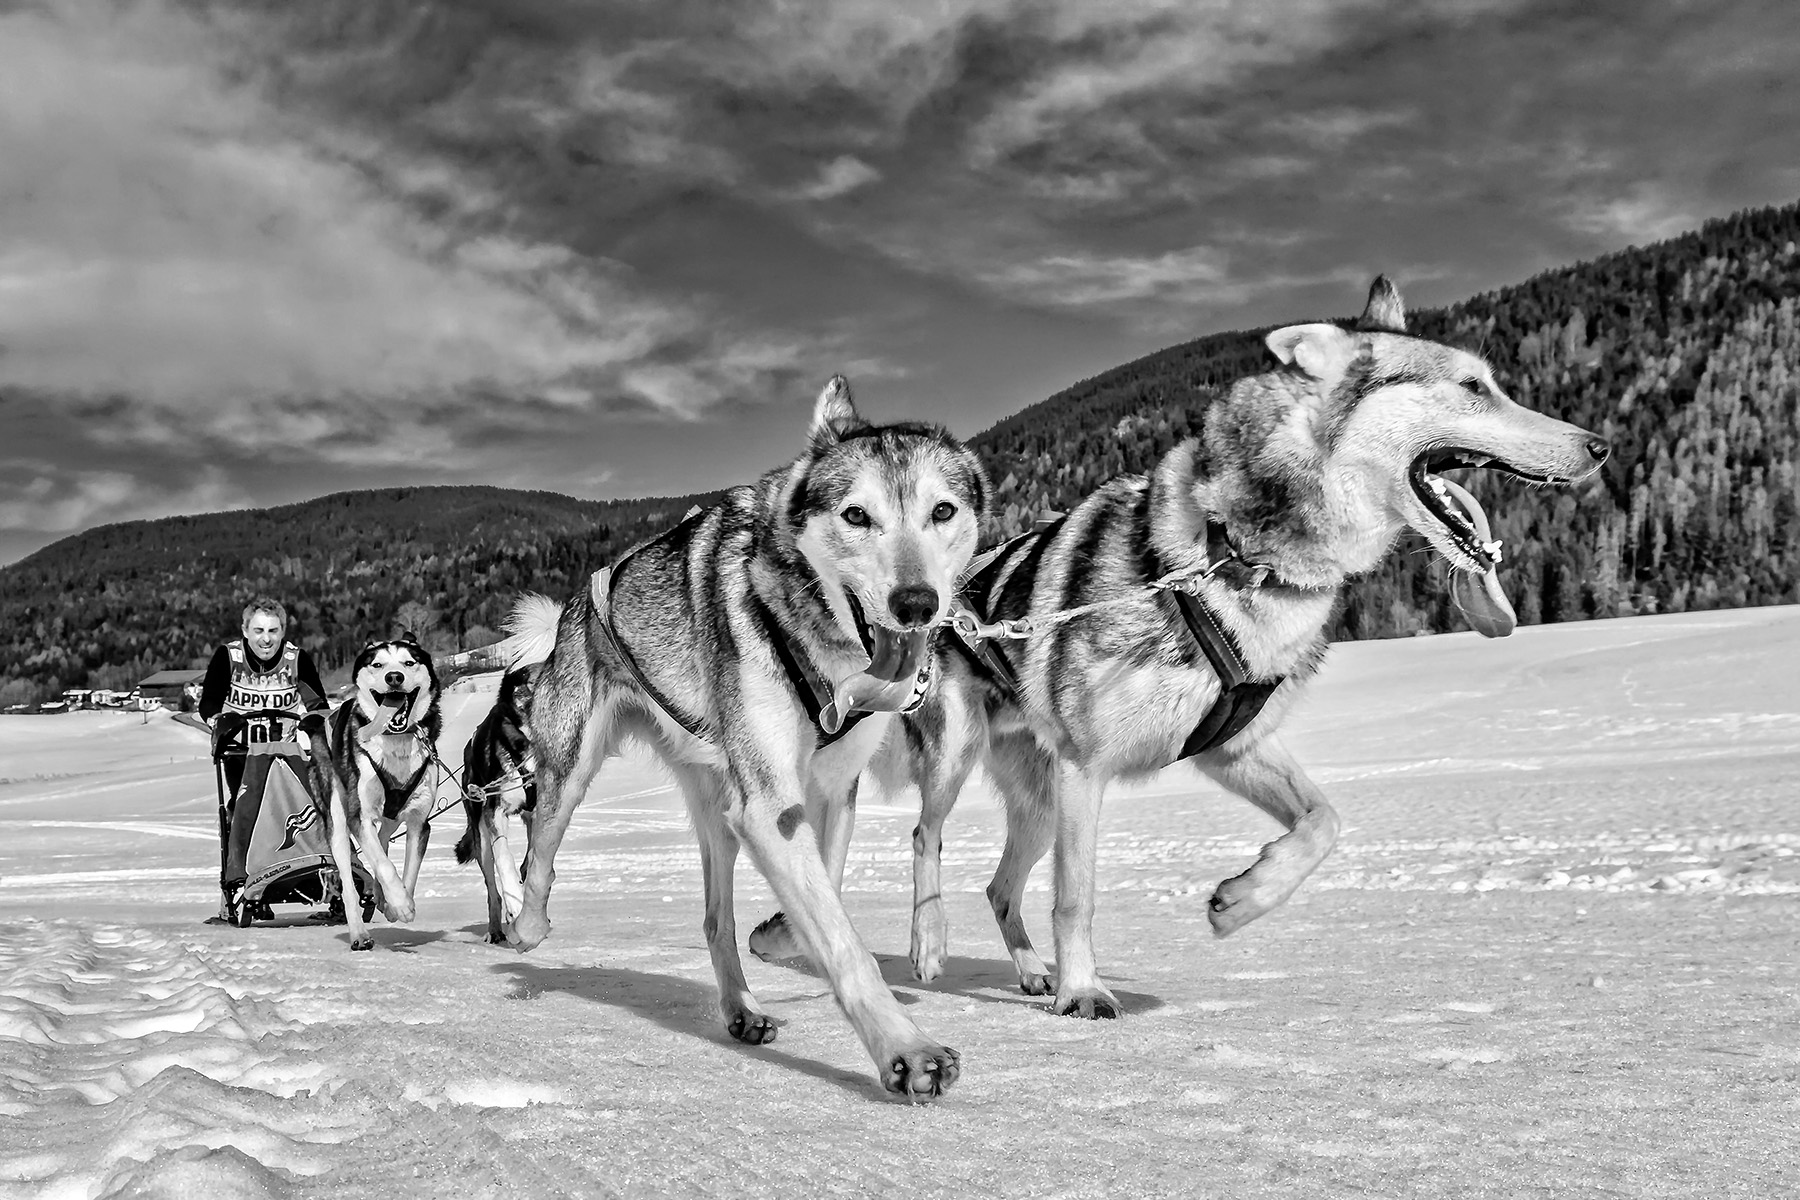 Inzell - Dog slide Track, Germany